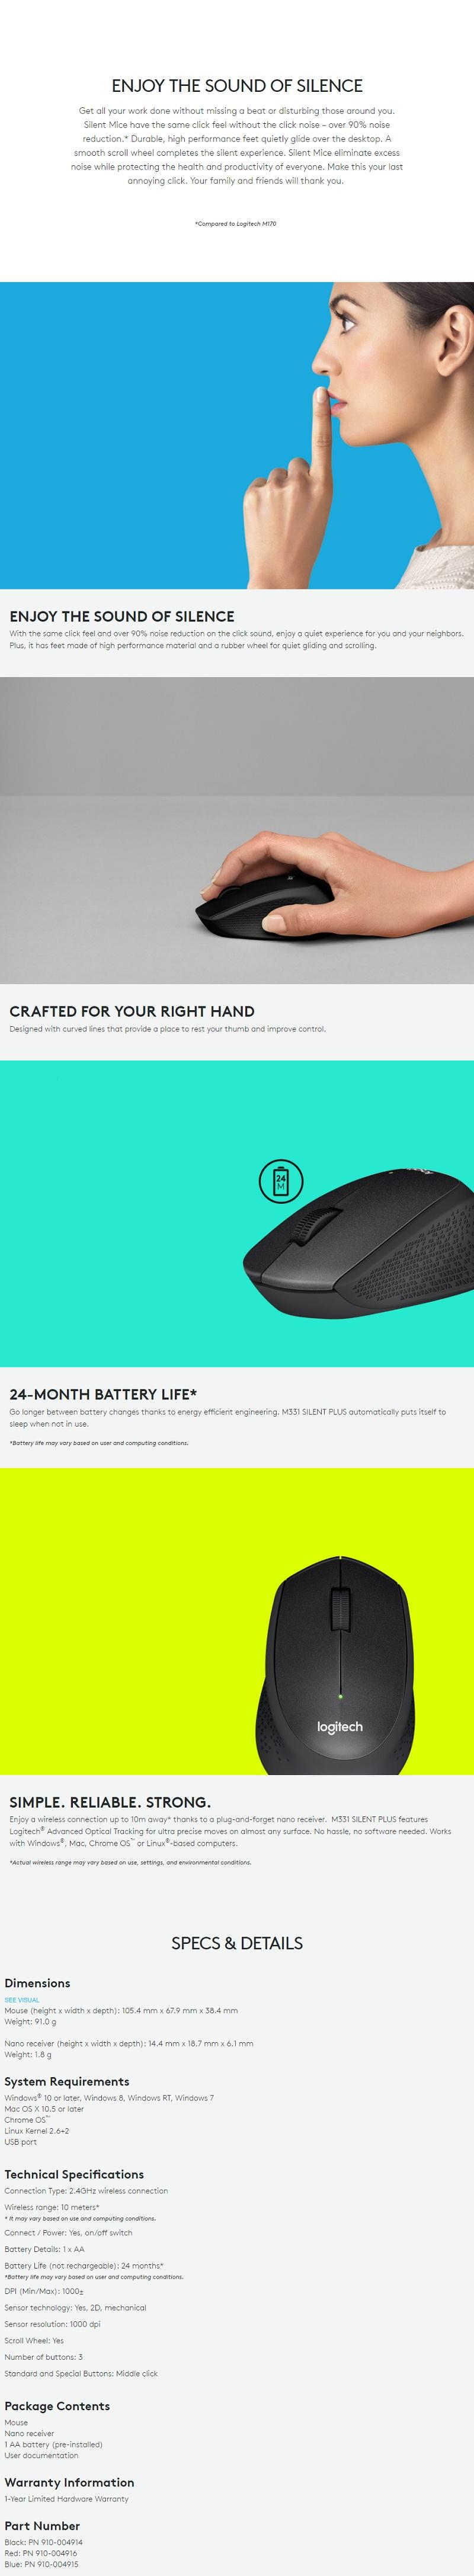 Logitech M331 Silent Plus Wireless Mouse Daftar Update Harga Garansi Resmi Original Specifications Of Black